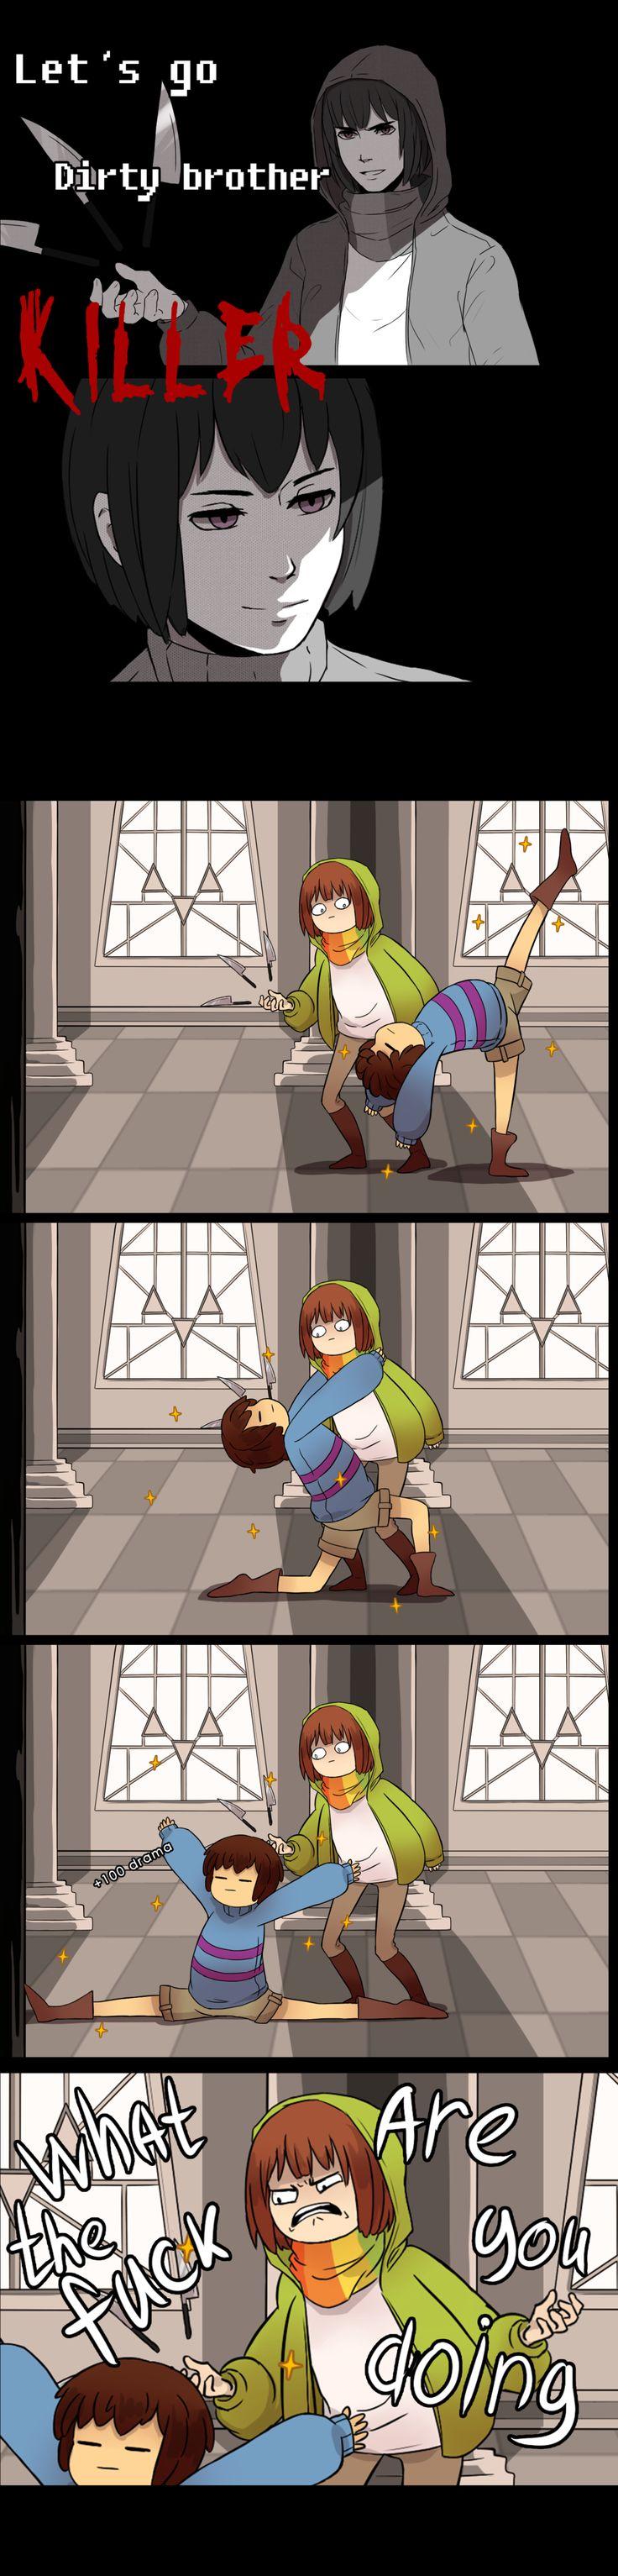 StoryShift (Last Corridor) by Tanuki-desu